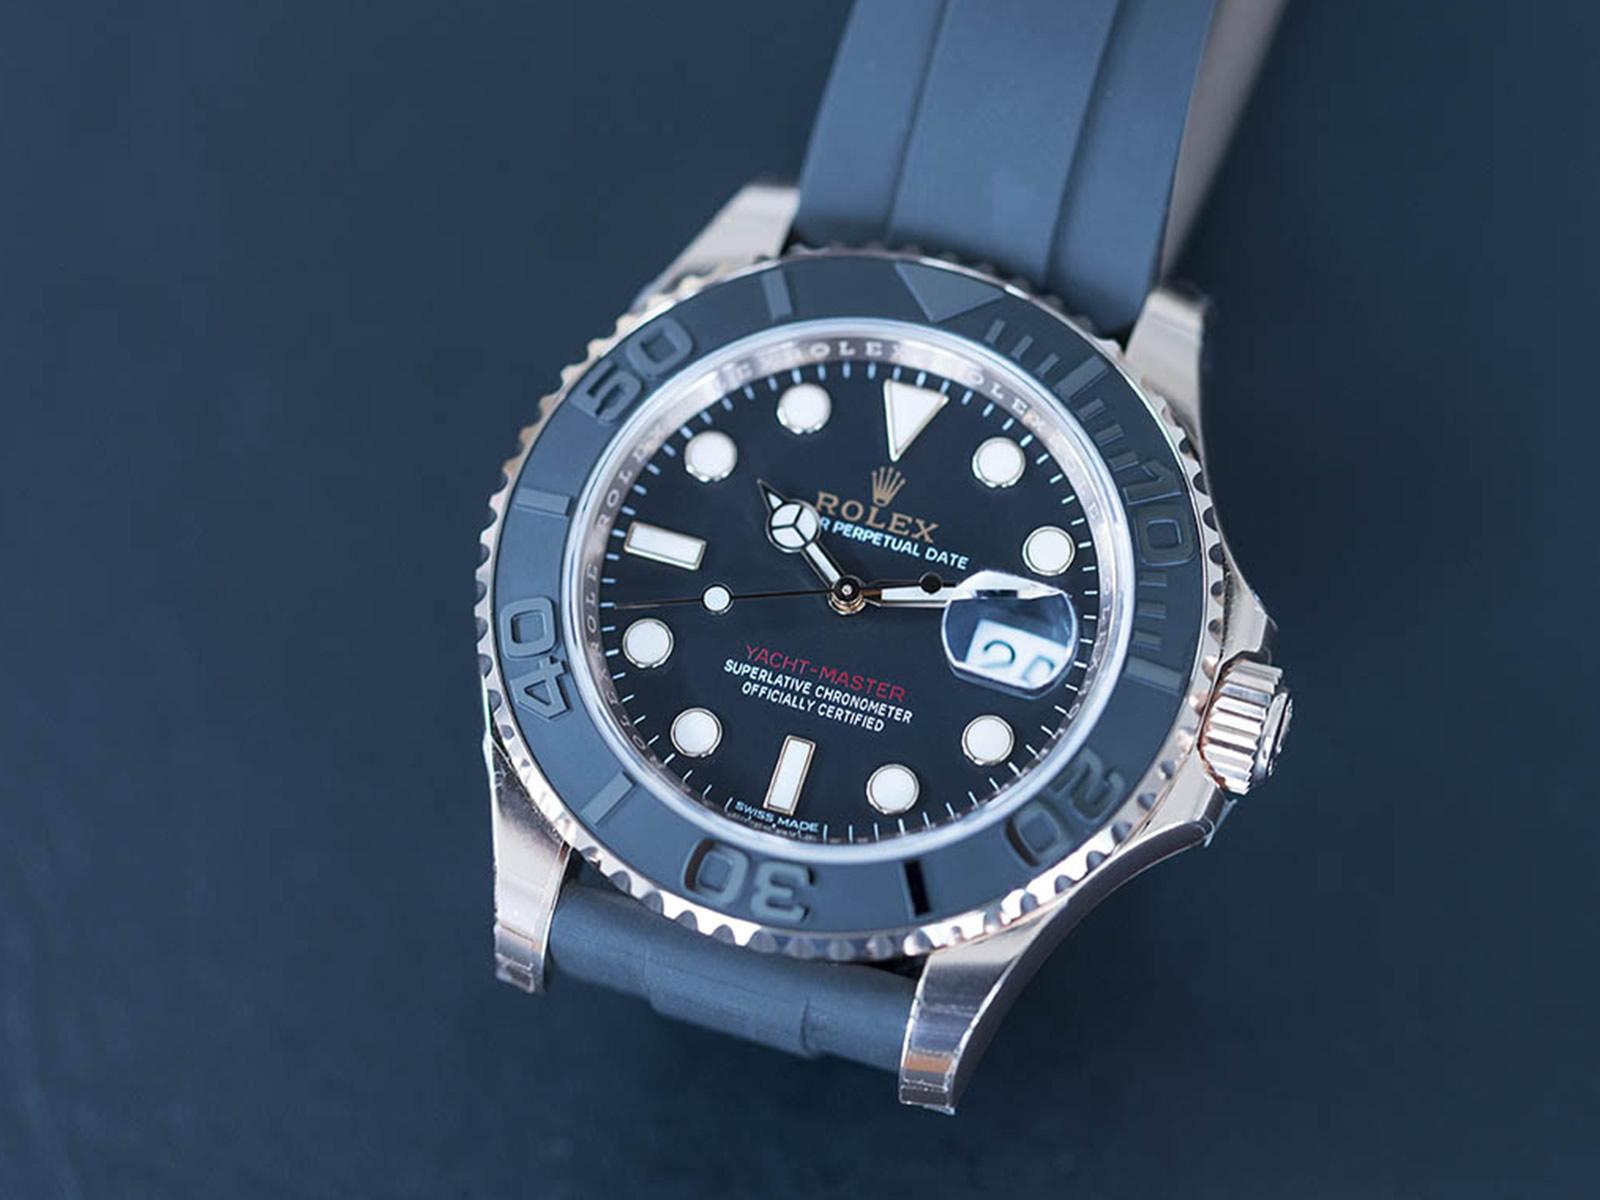 116655-rolex-yacht-master-40-oyster-40mm-everose-gold-1-.jpg